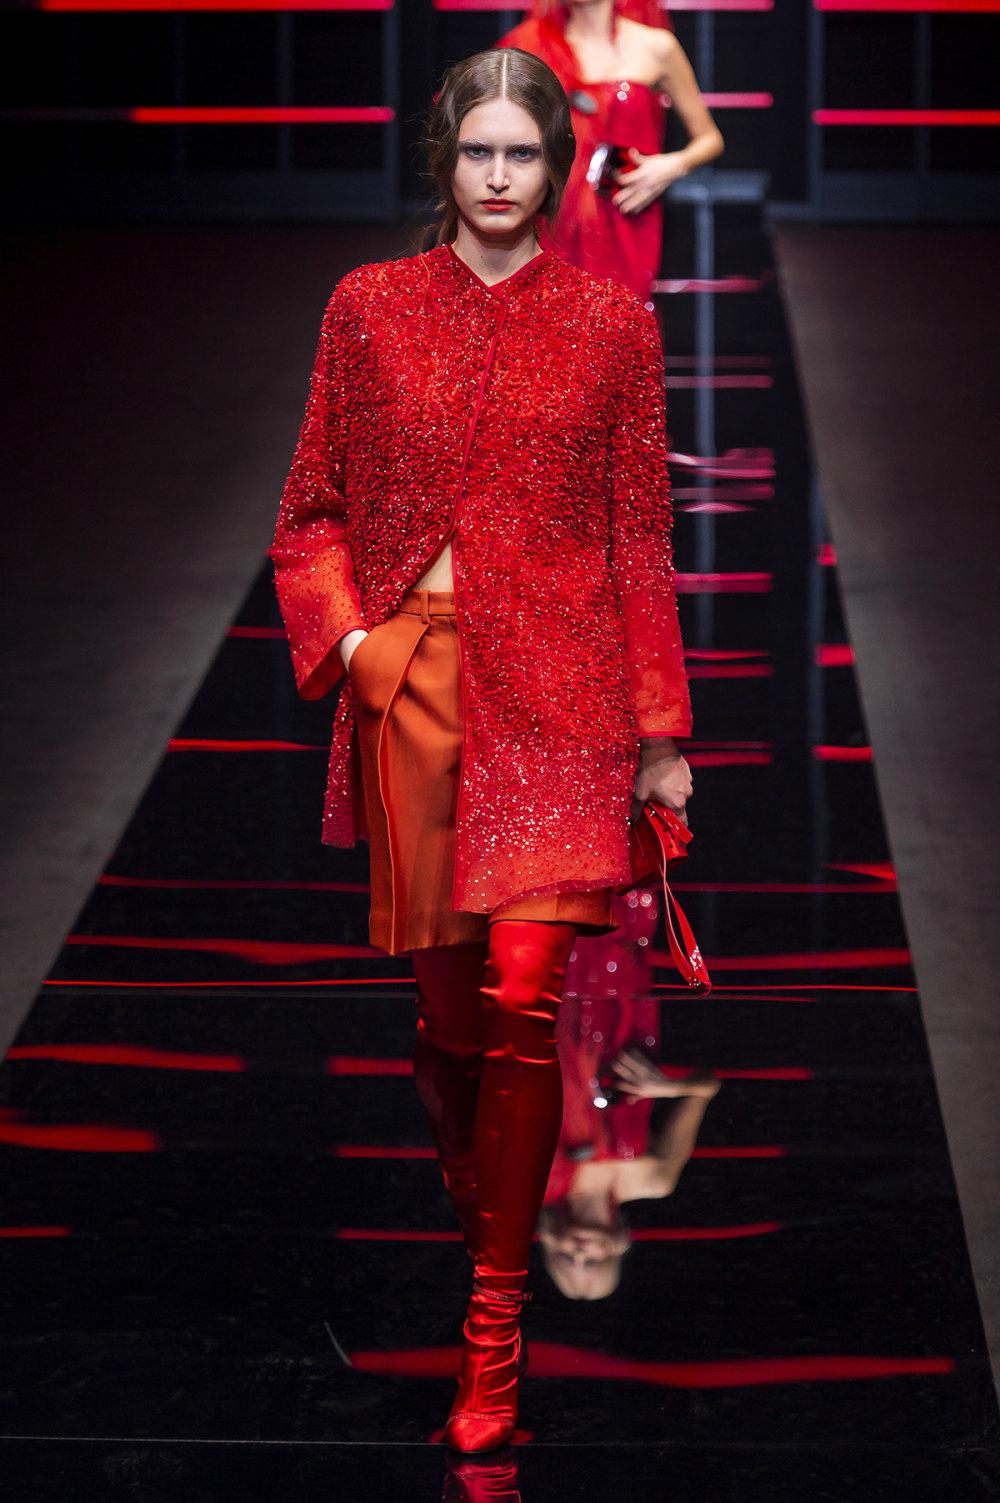 Emporio Armani时装系列畅的裤子带有柔滑裙子的鸡尾酒礼服-65.jpg